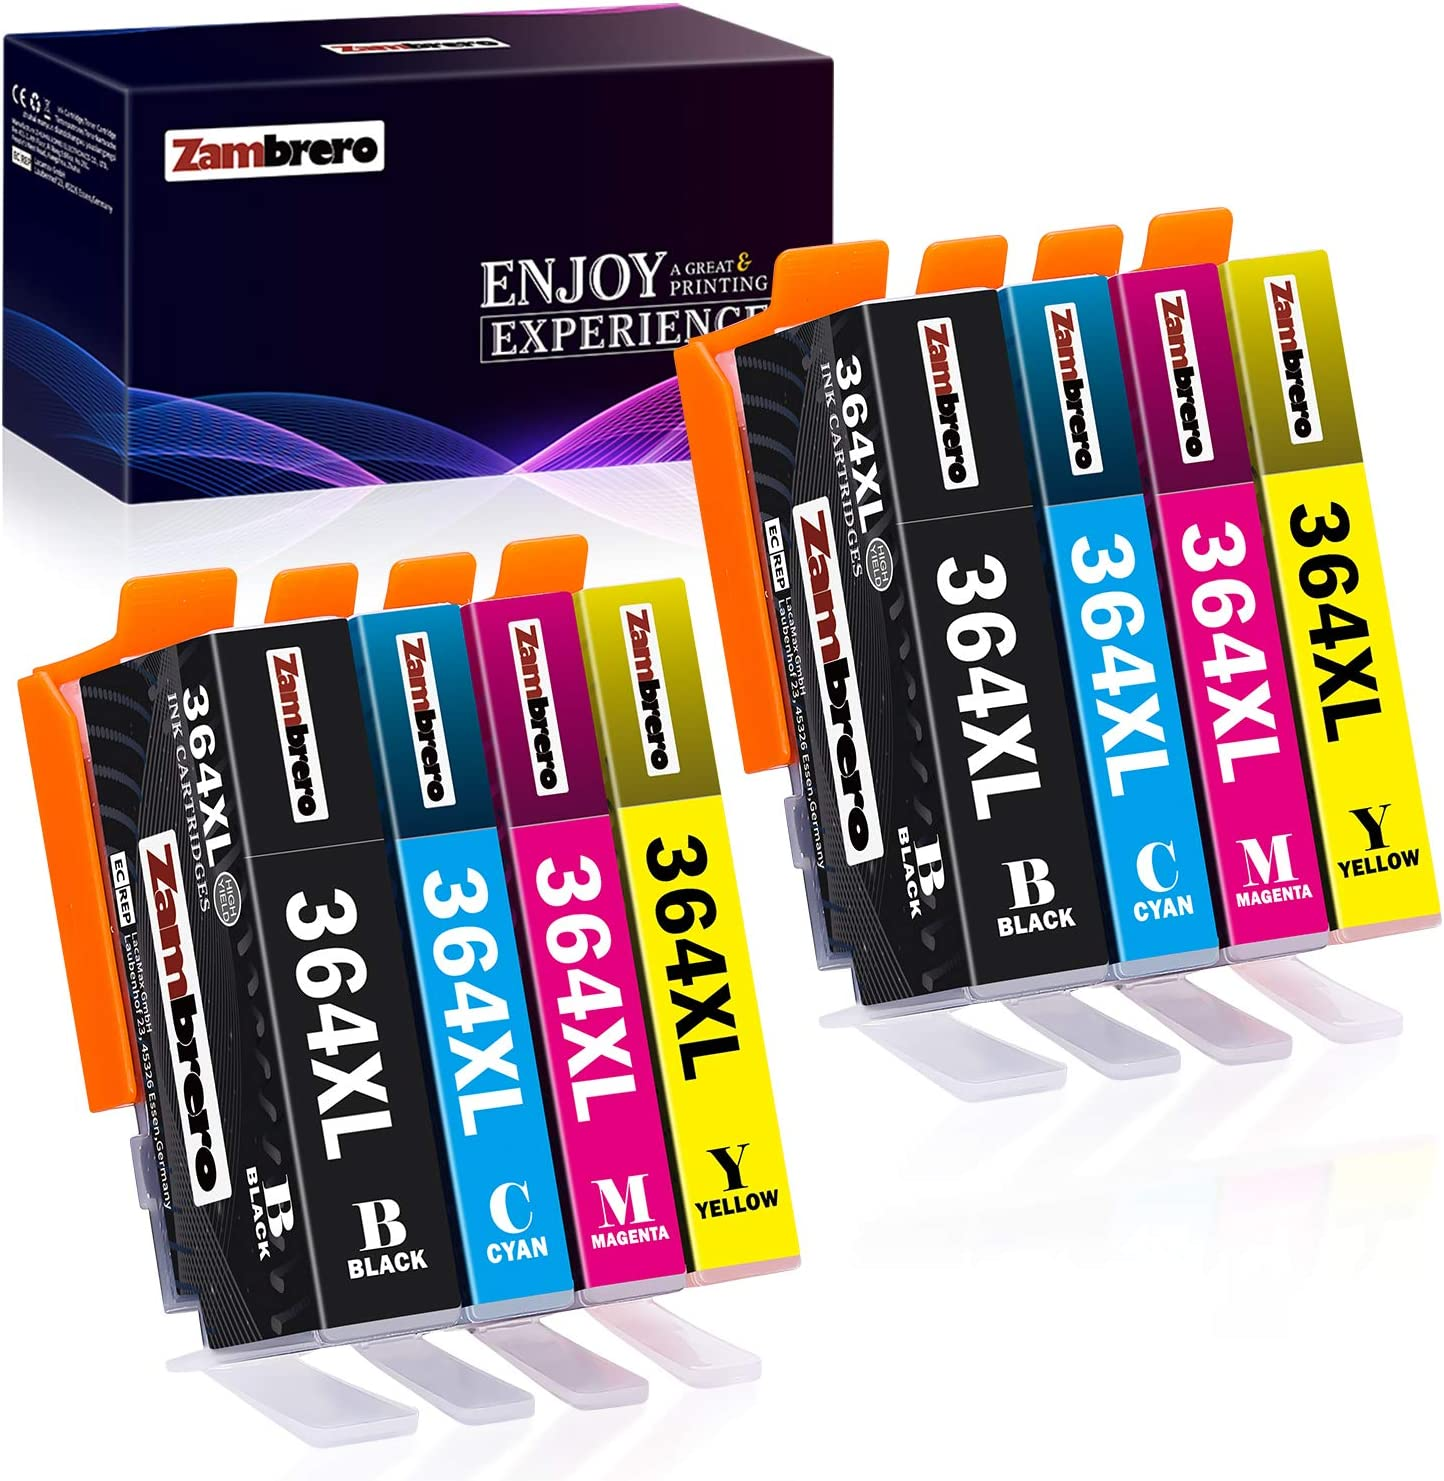 Zambrero 364XL Reemplazo para HP 364 XL Cartuchos de tinta Compatibles con HP Photosmart 5520 5510 6520 7520 5522 6510 7510, HP Officejet 4620, HP Deskjet 3520 3070A (8 Pack): Amazon.es: Informática